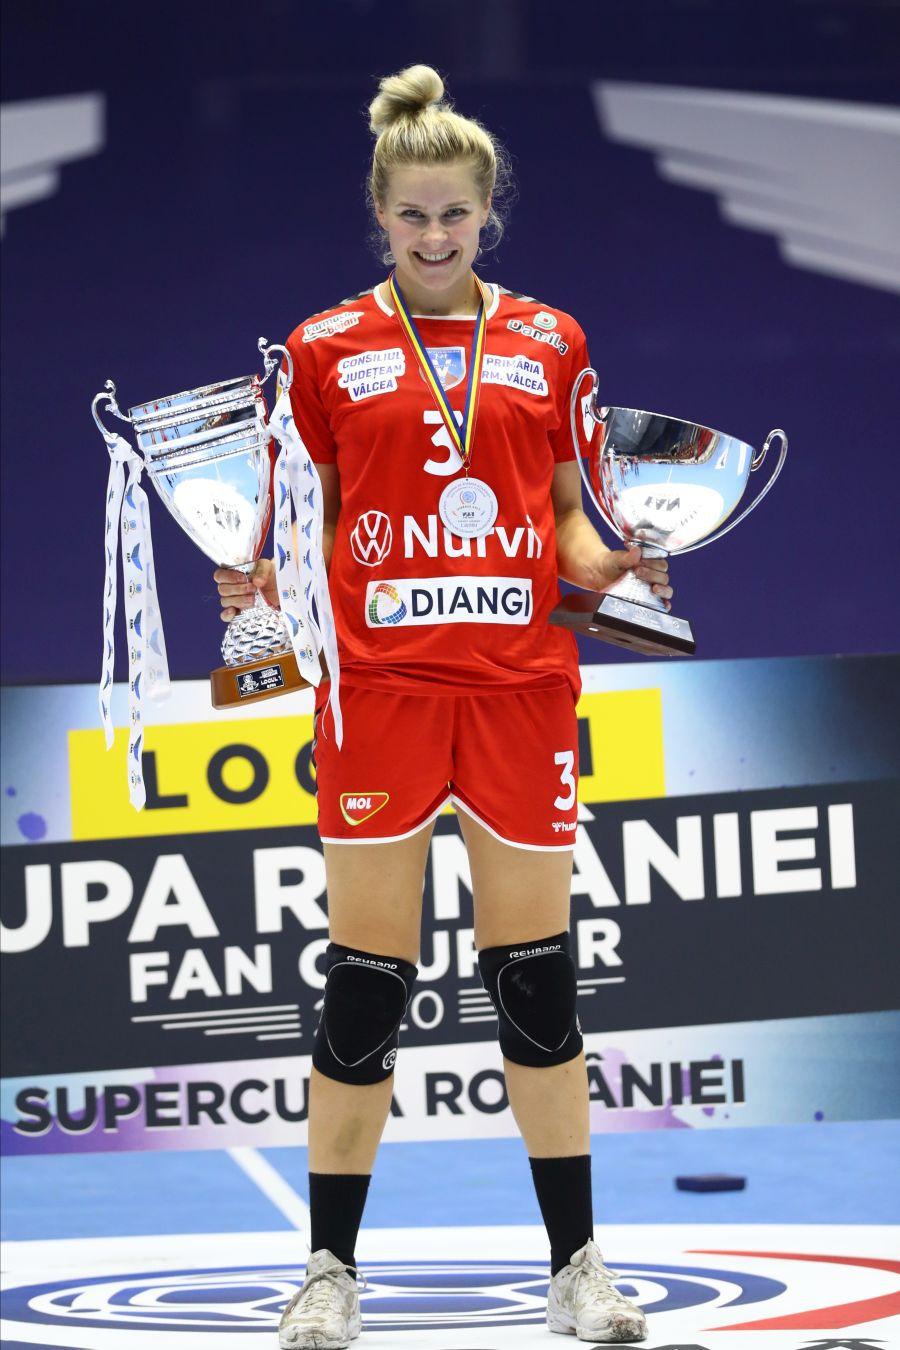 Primele trofee castigate in Romania FOTO Marius Ionescu